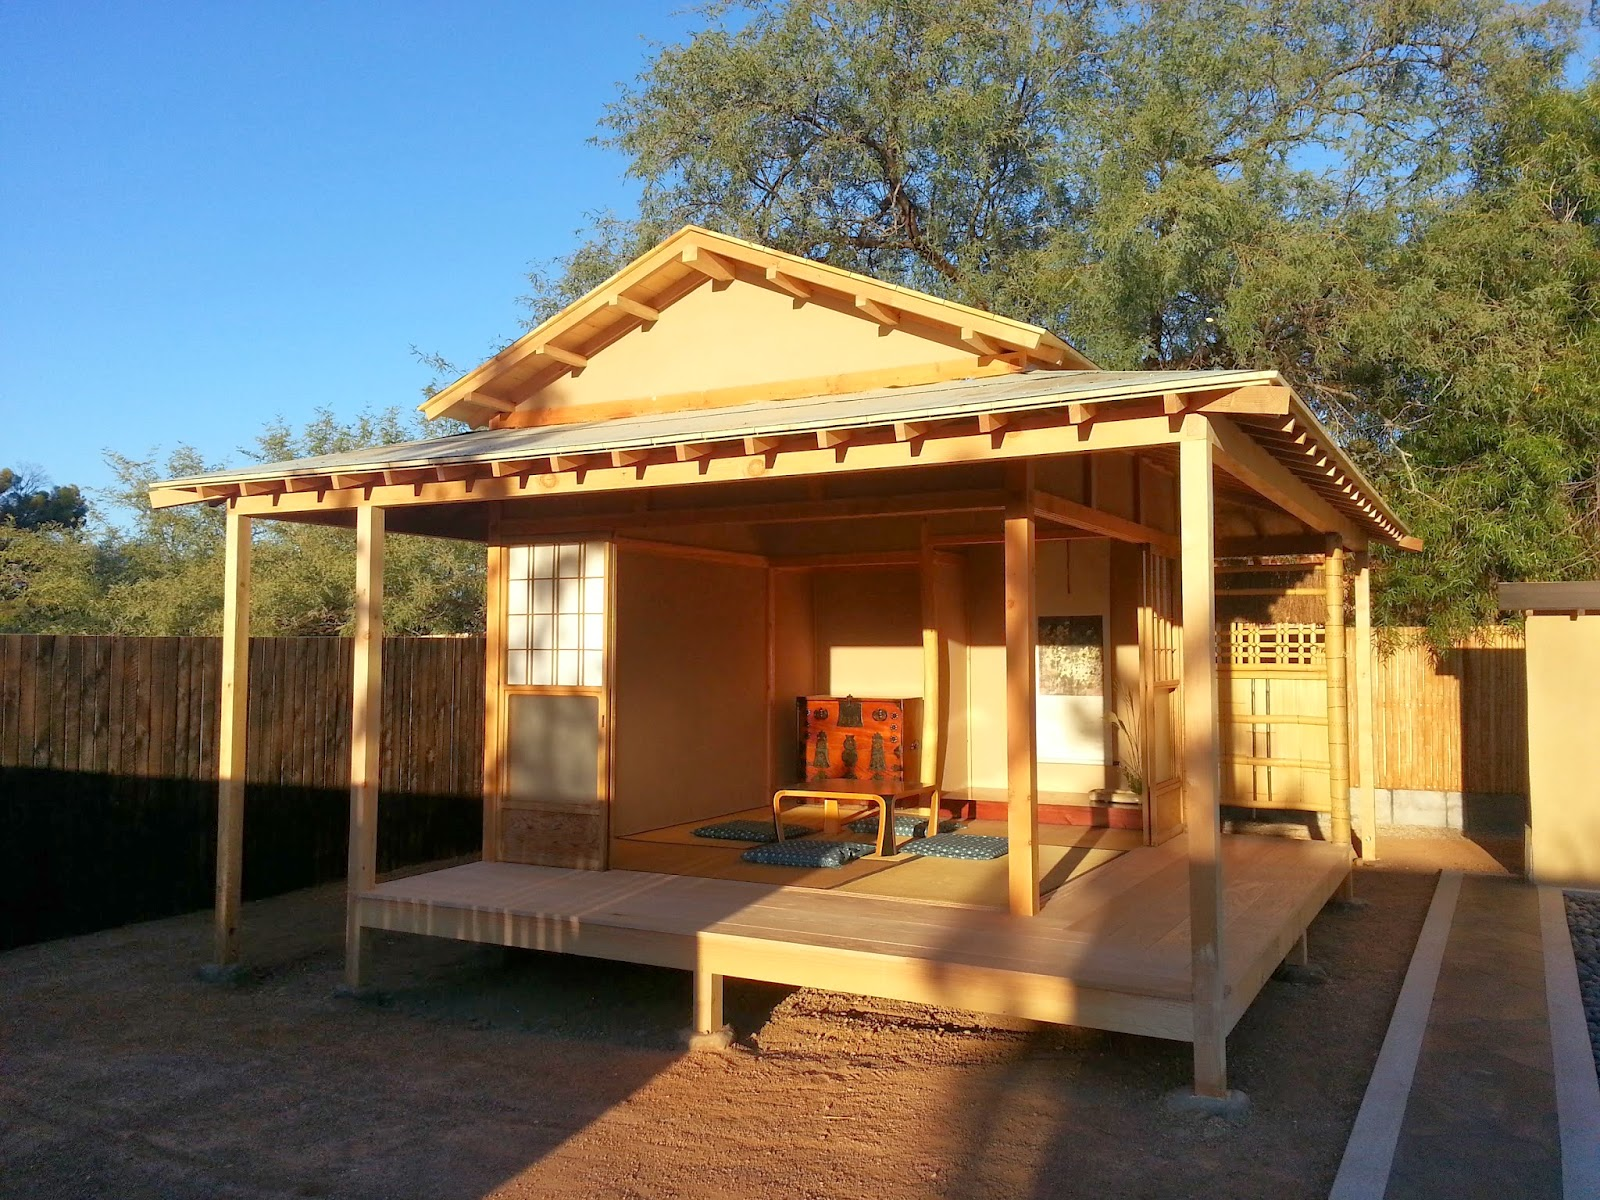 Yume Japanese Garden, Tucson, AZ : Tea House | BearFoot ...